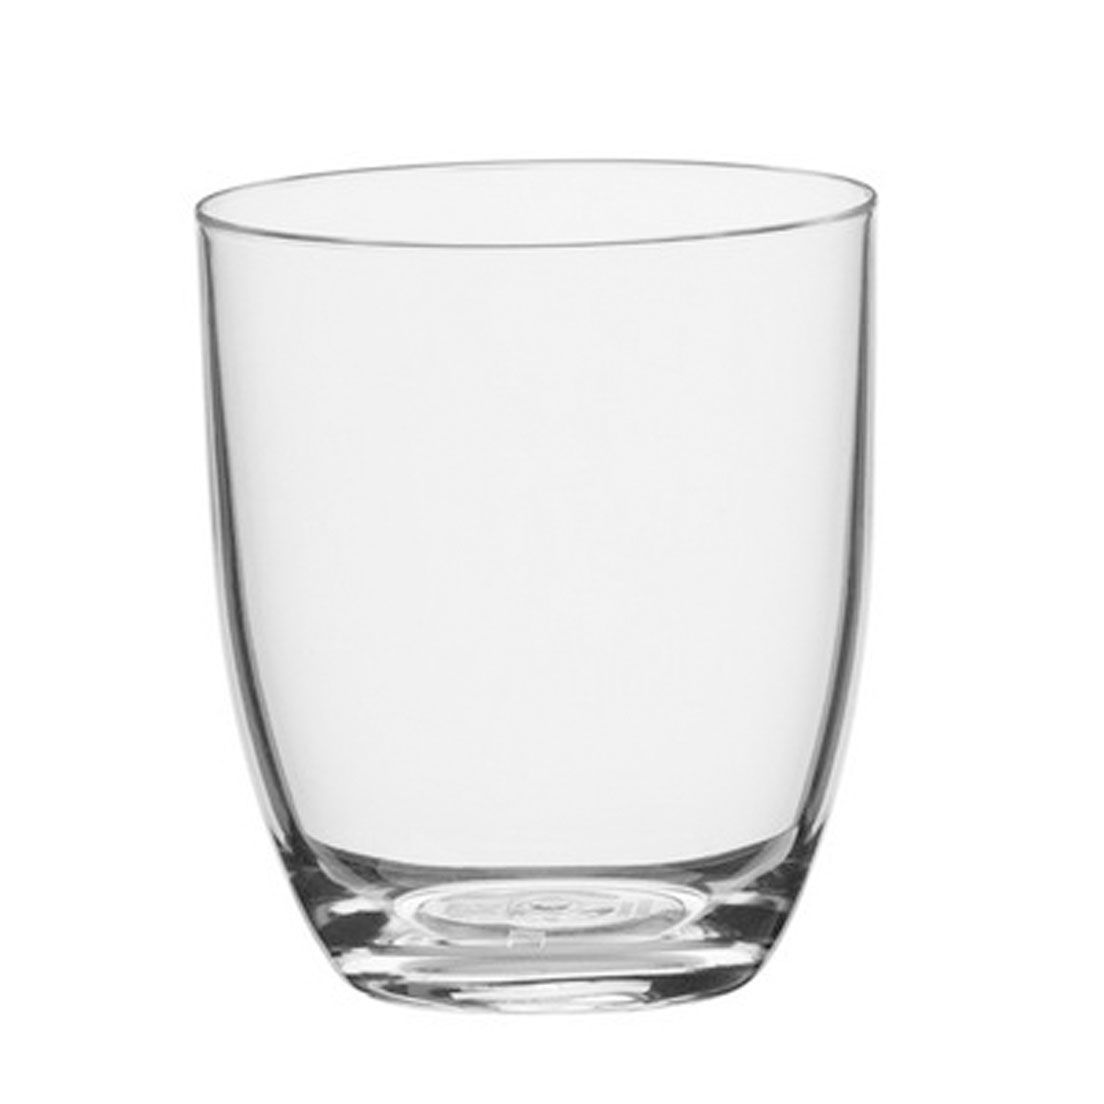 Copo para Drinks de Acrílico Cocktail 400Ml